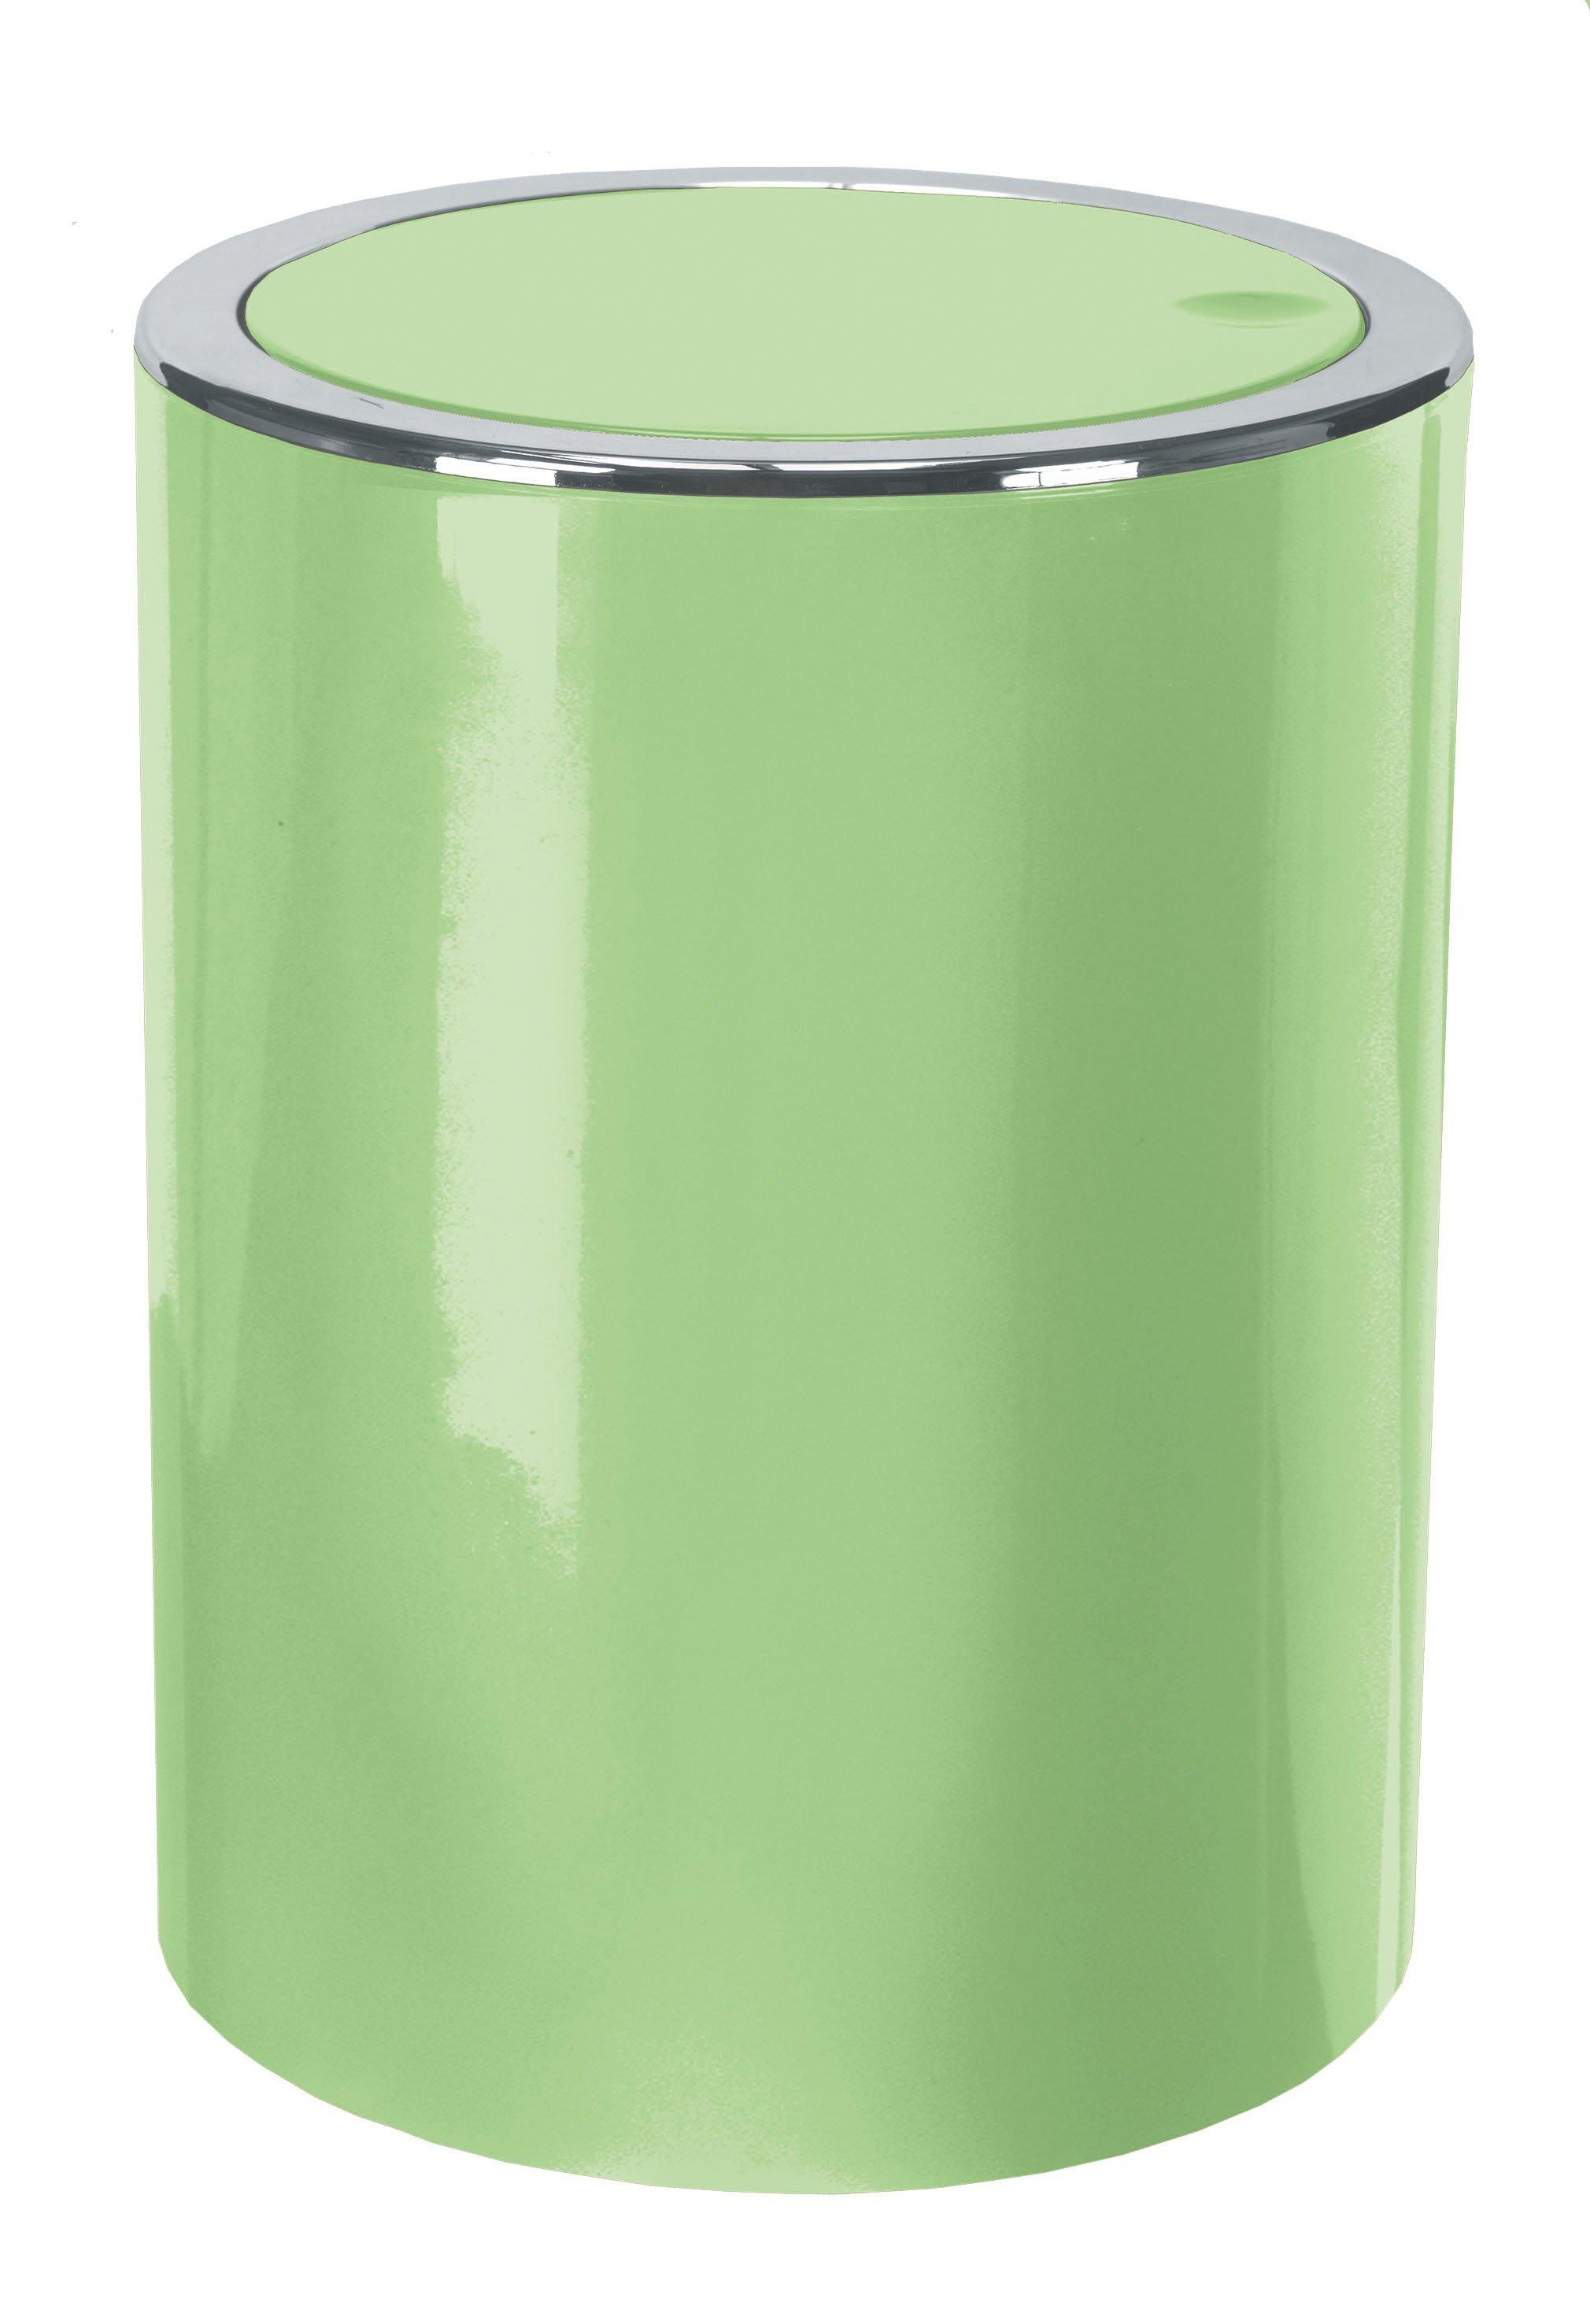 Kosmetikeimer Clap Distel B:19cm